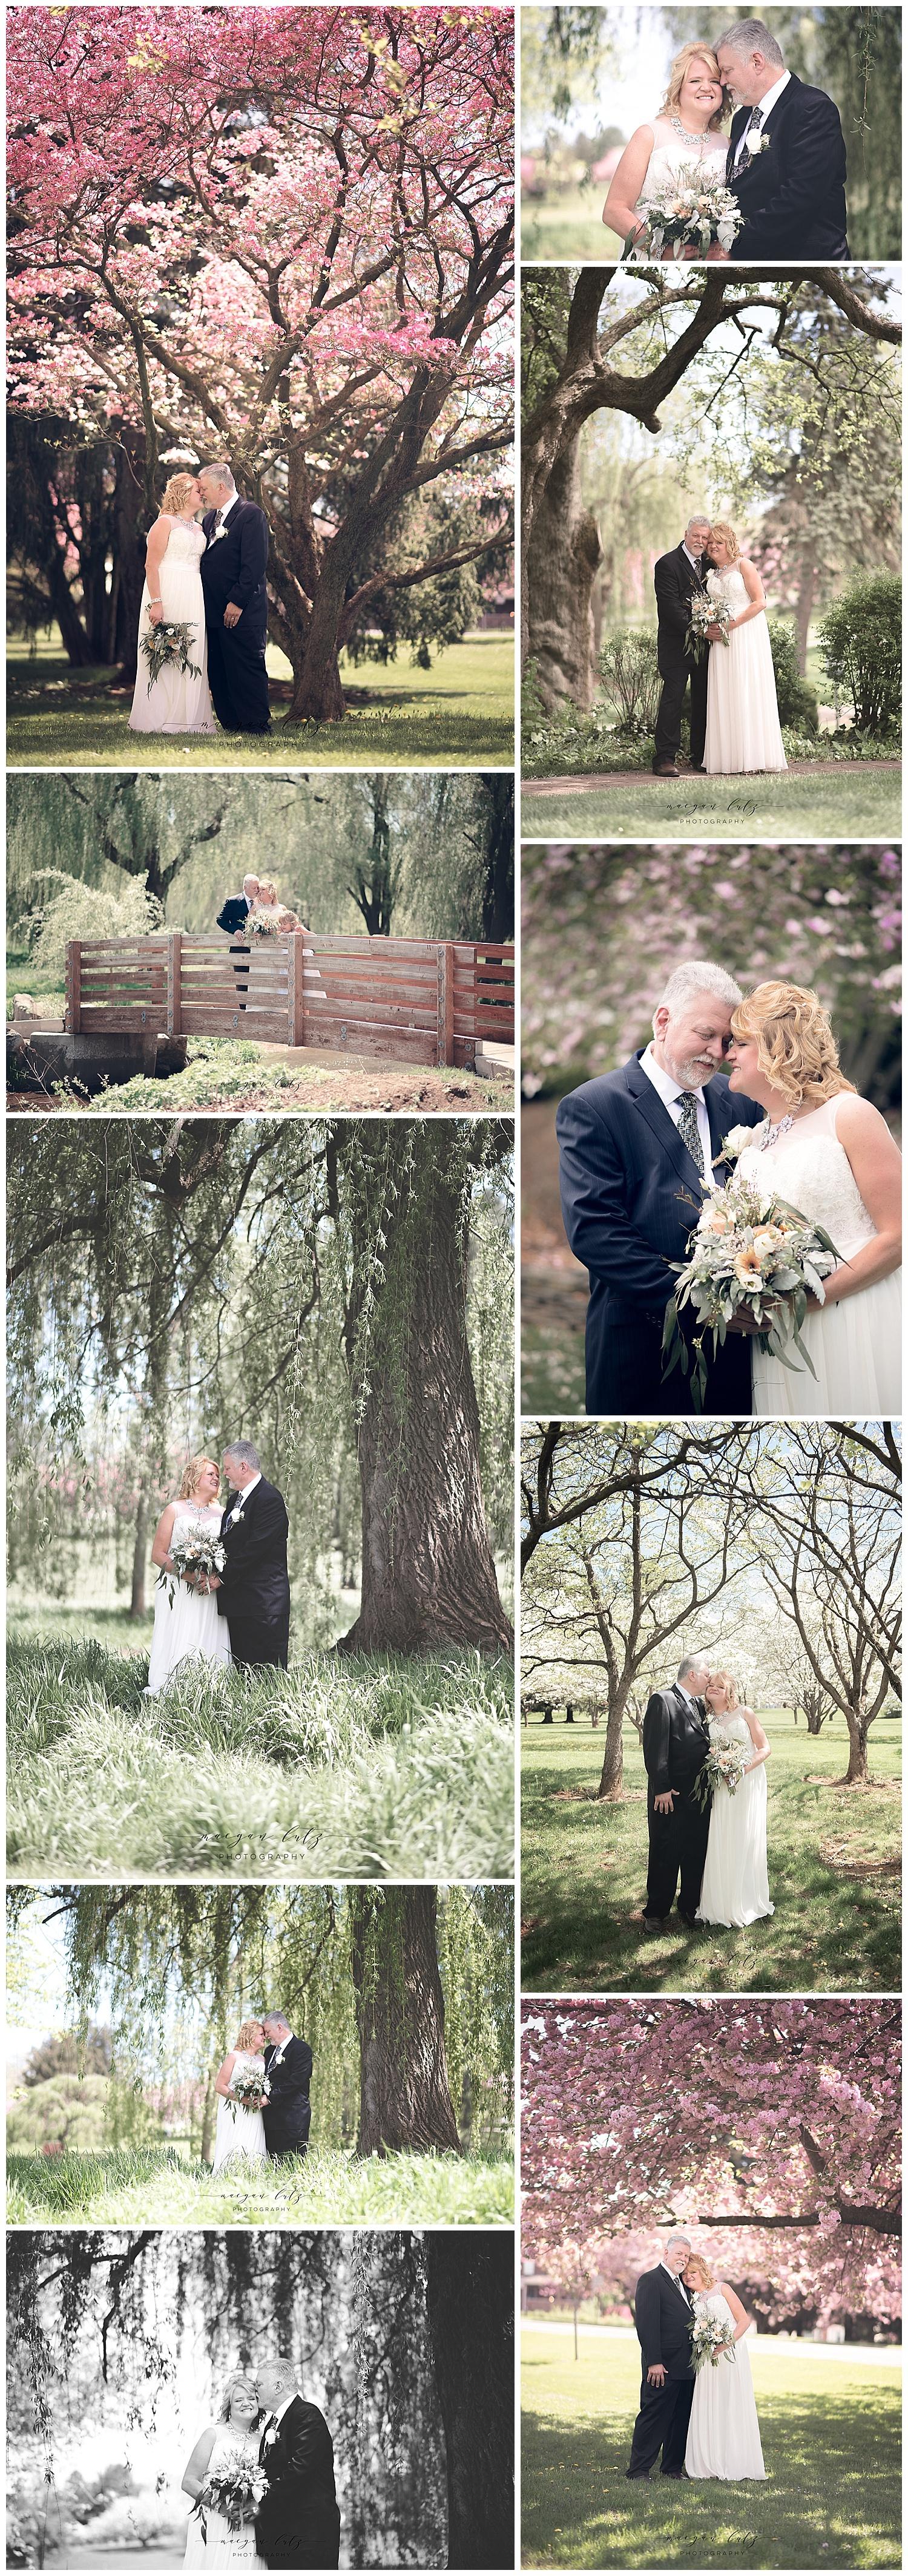 Wedding Photographer in Scranton, PA at the Rose Garden in Allentown